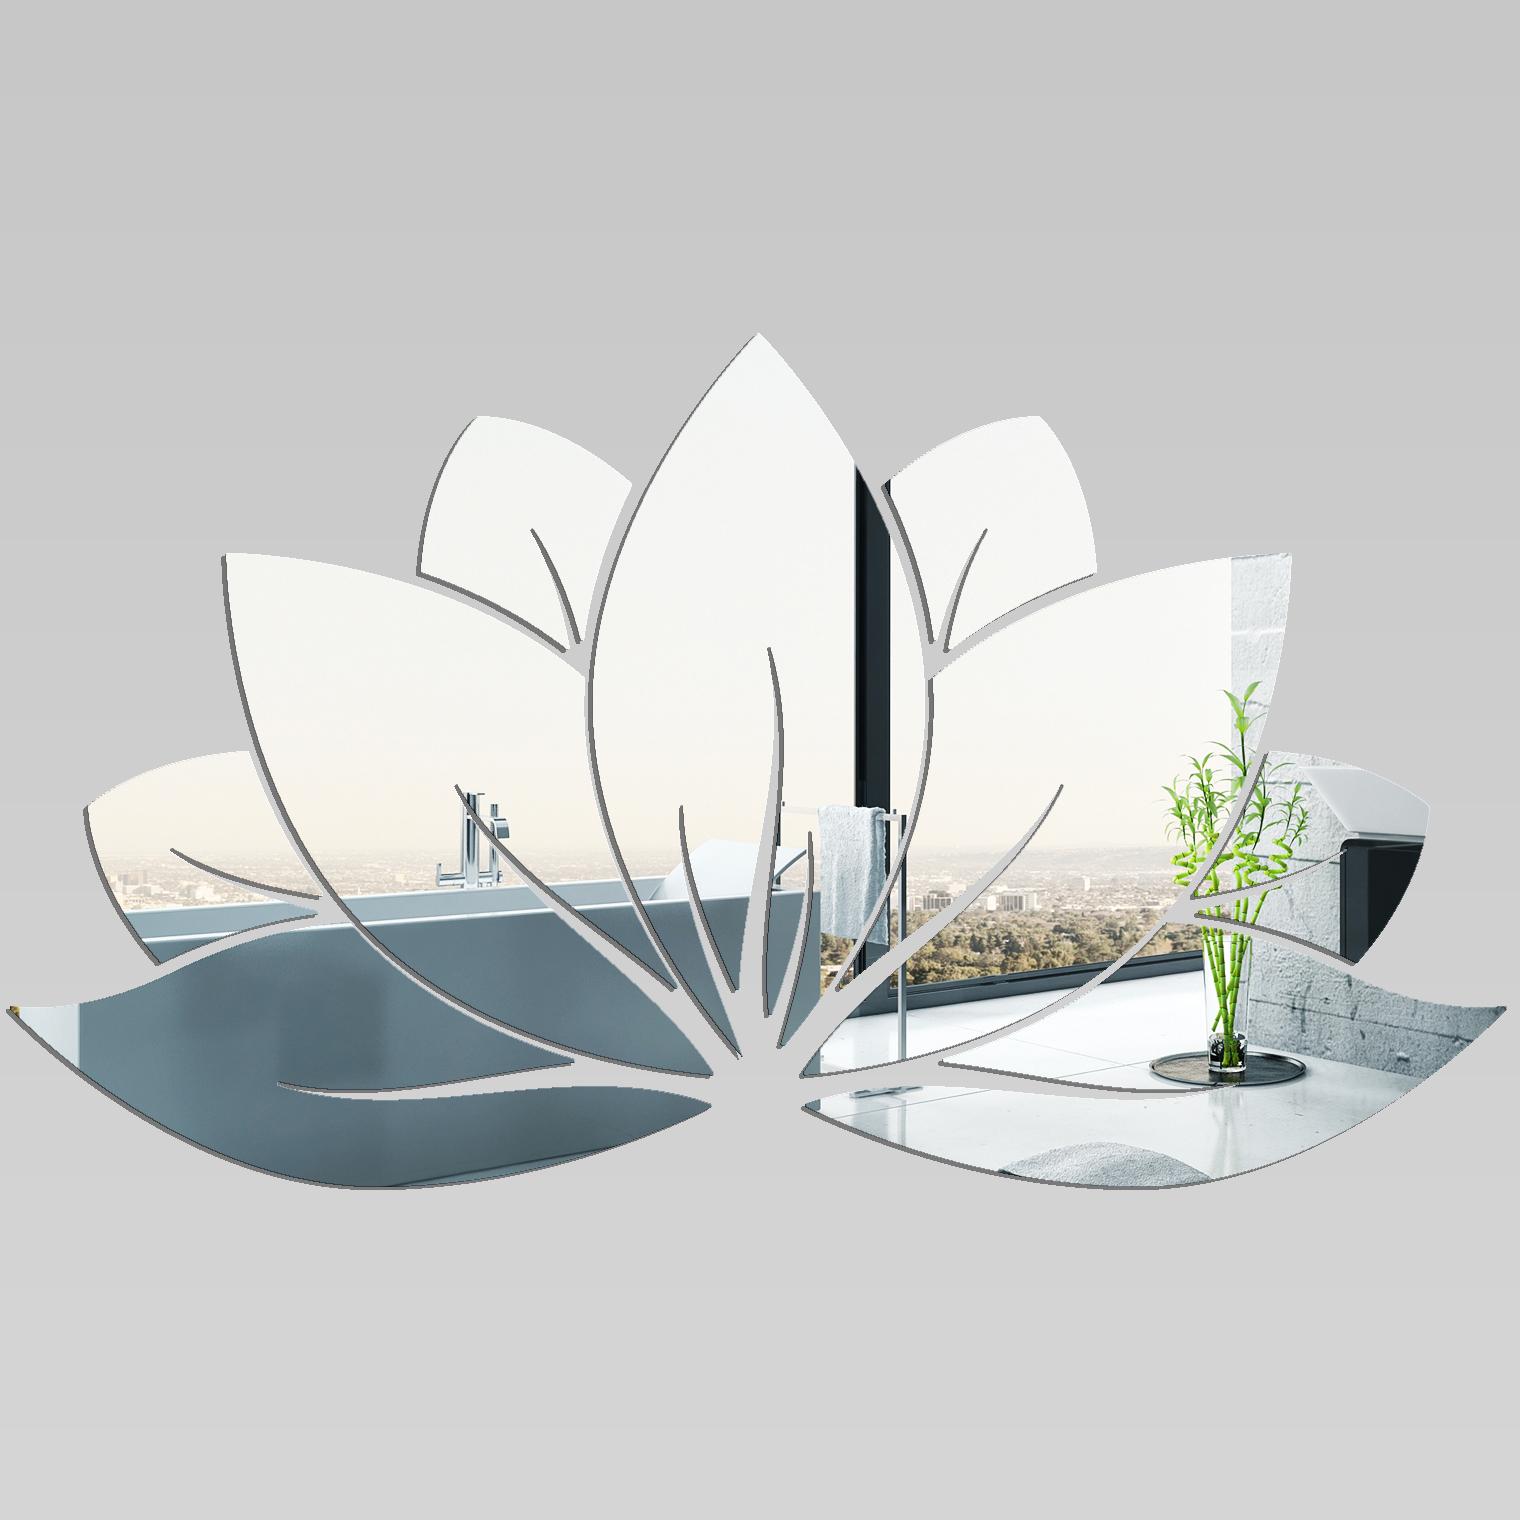 Miroir plexiglass acrylique n nuphar 2 pas cher for Miroir zen nature